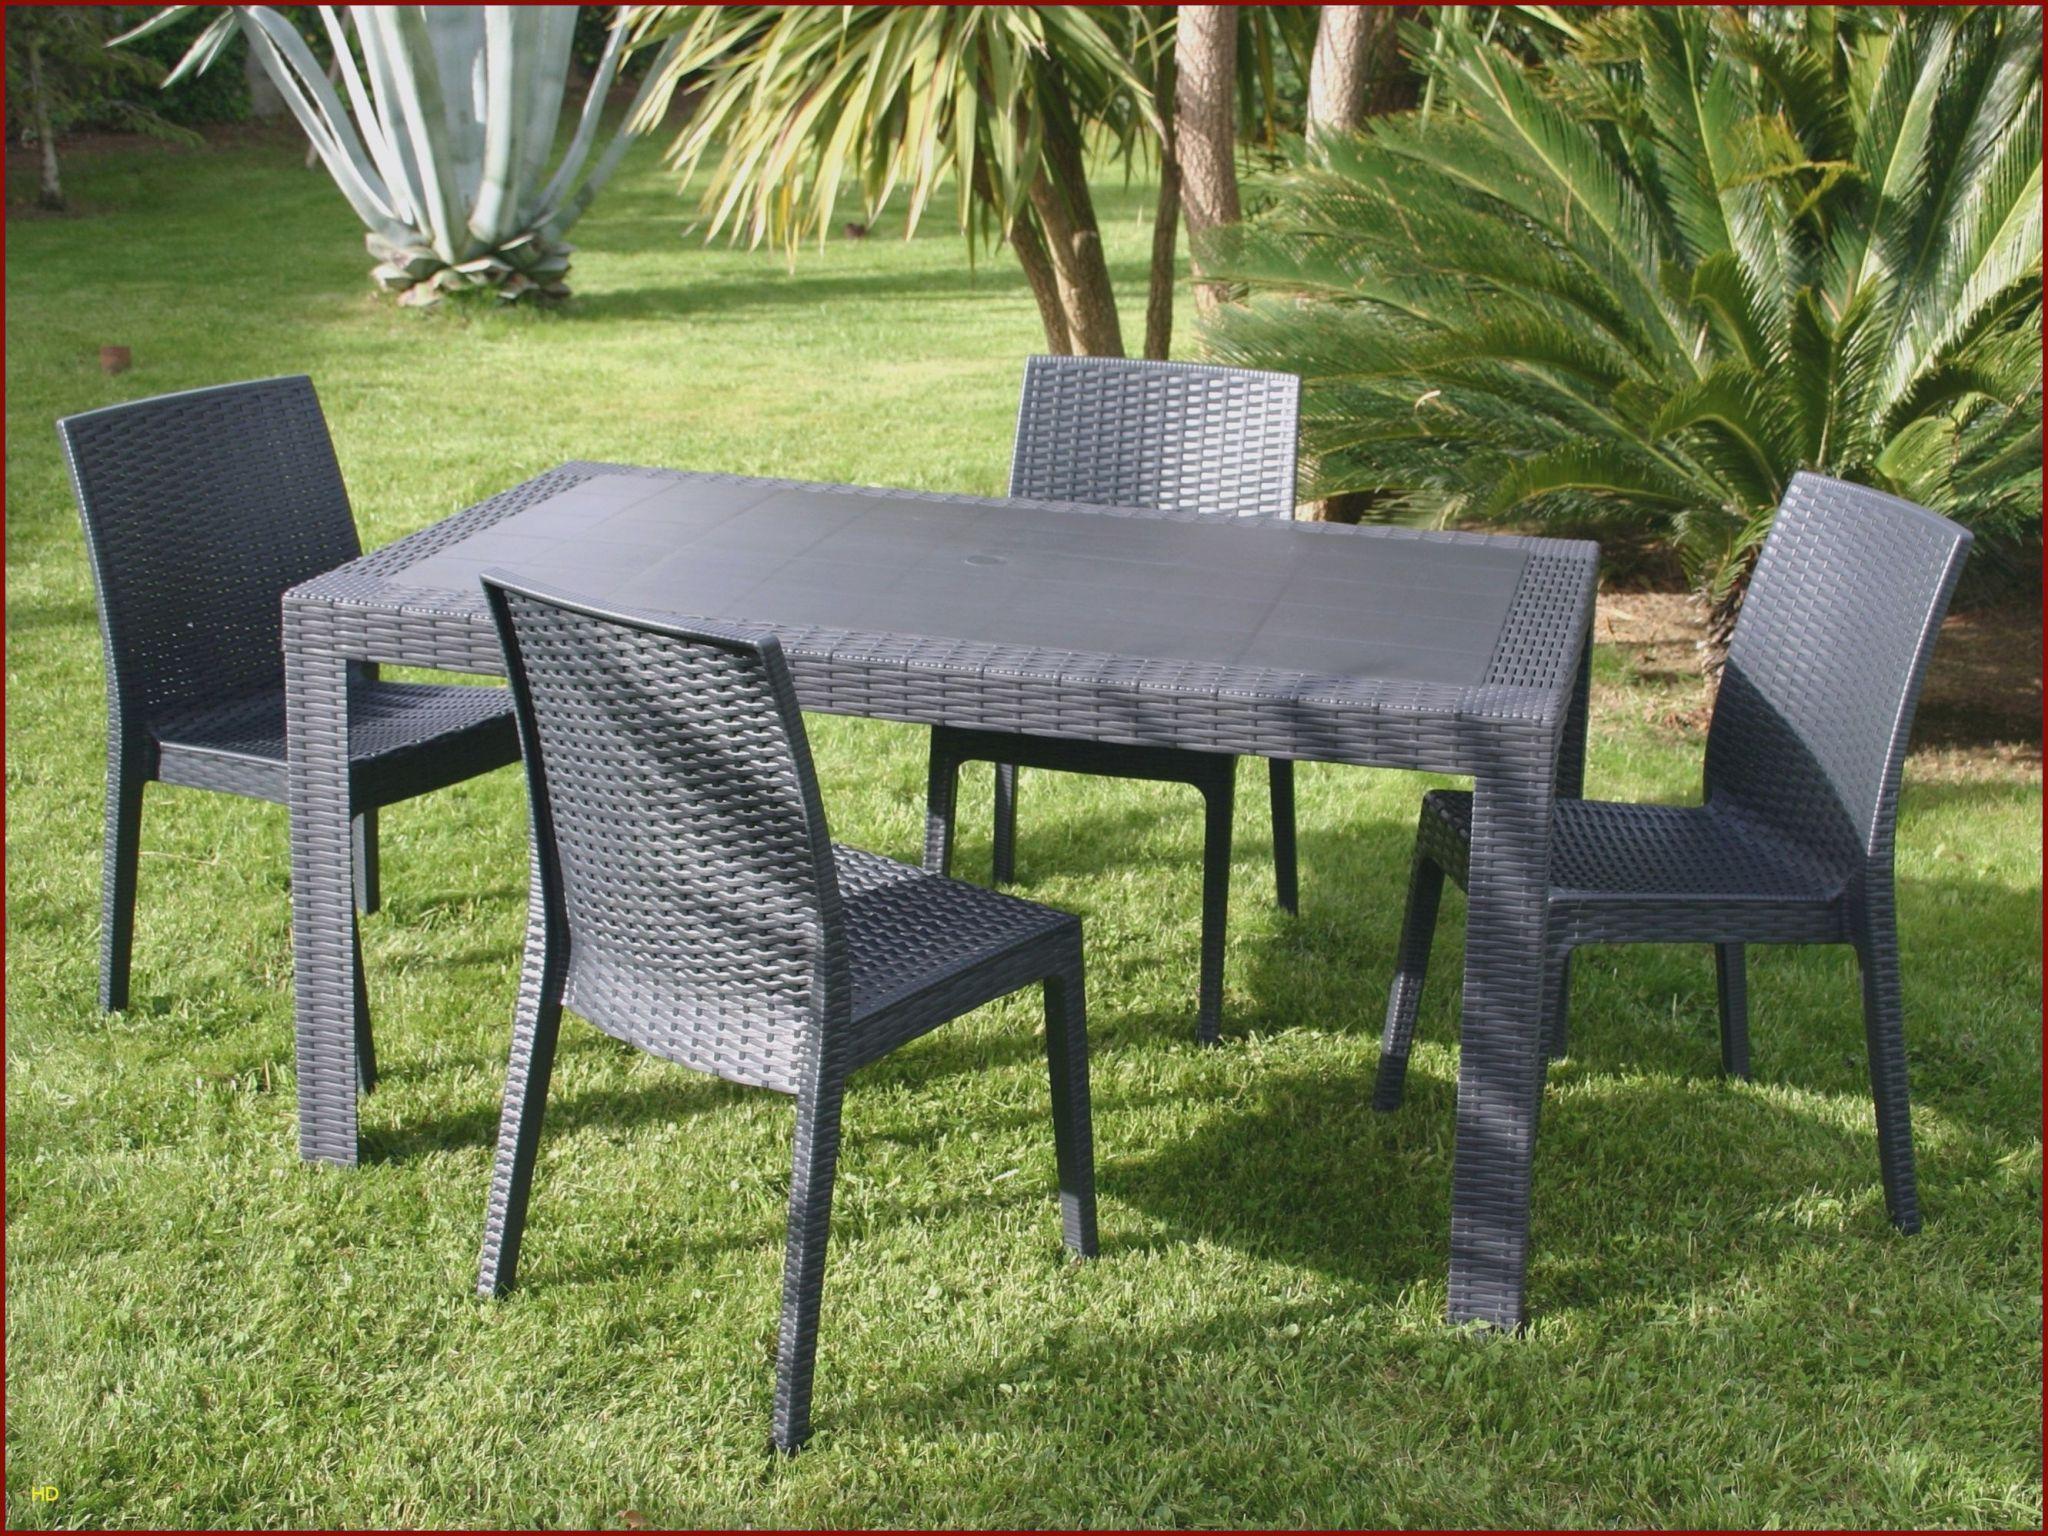 Table Pliante De Jardin Génial Chaises Luxe Chaise Ice 0d Table Jardin Resine Lovely Of 30 Best Of Table Pliante De Jardin